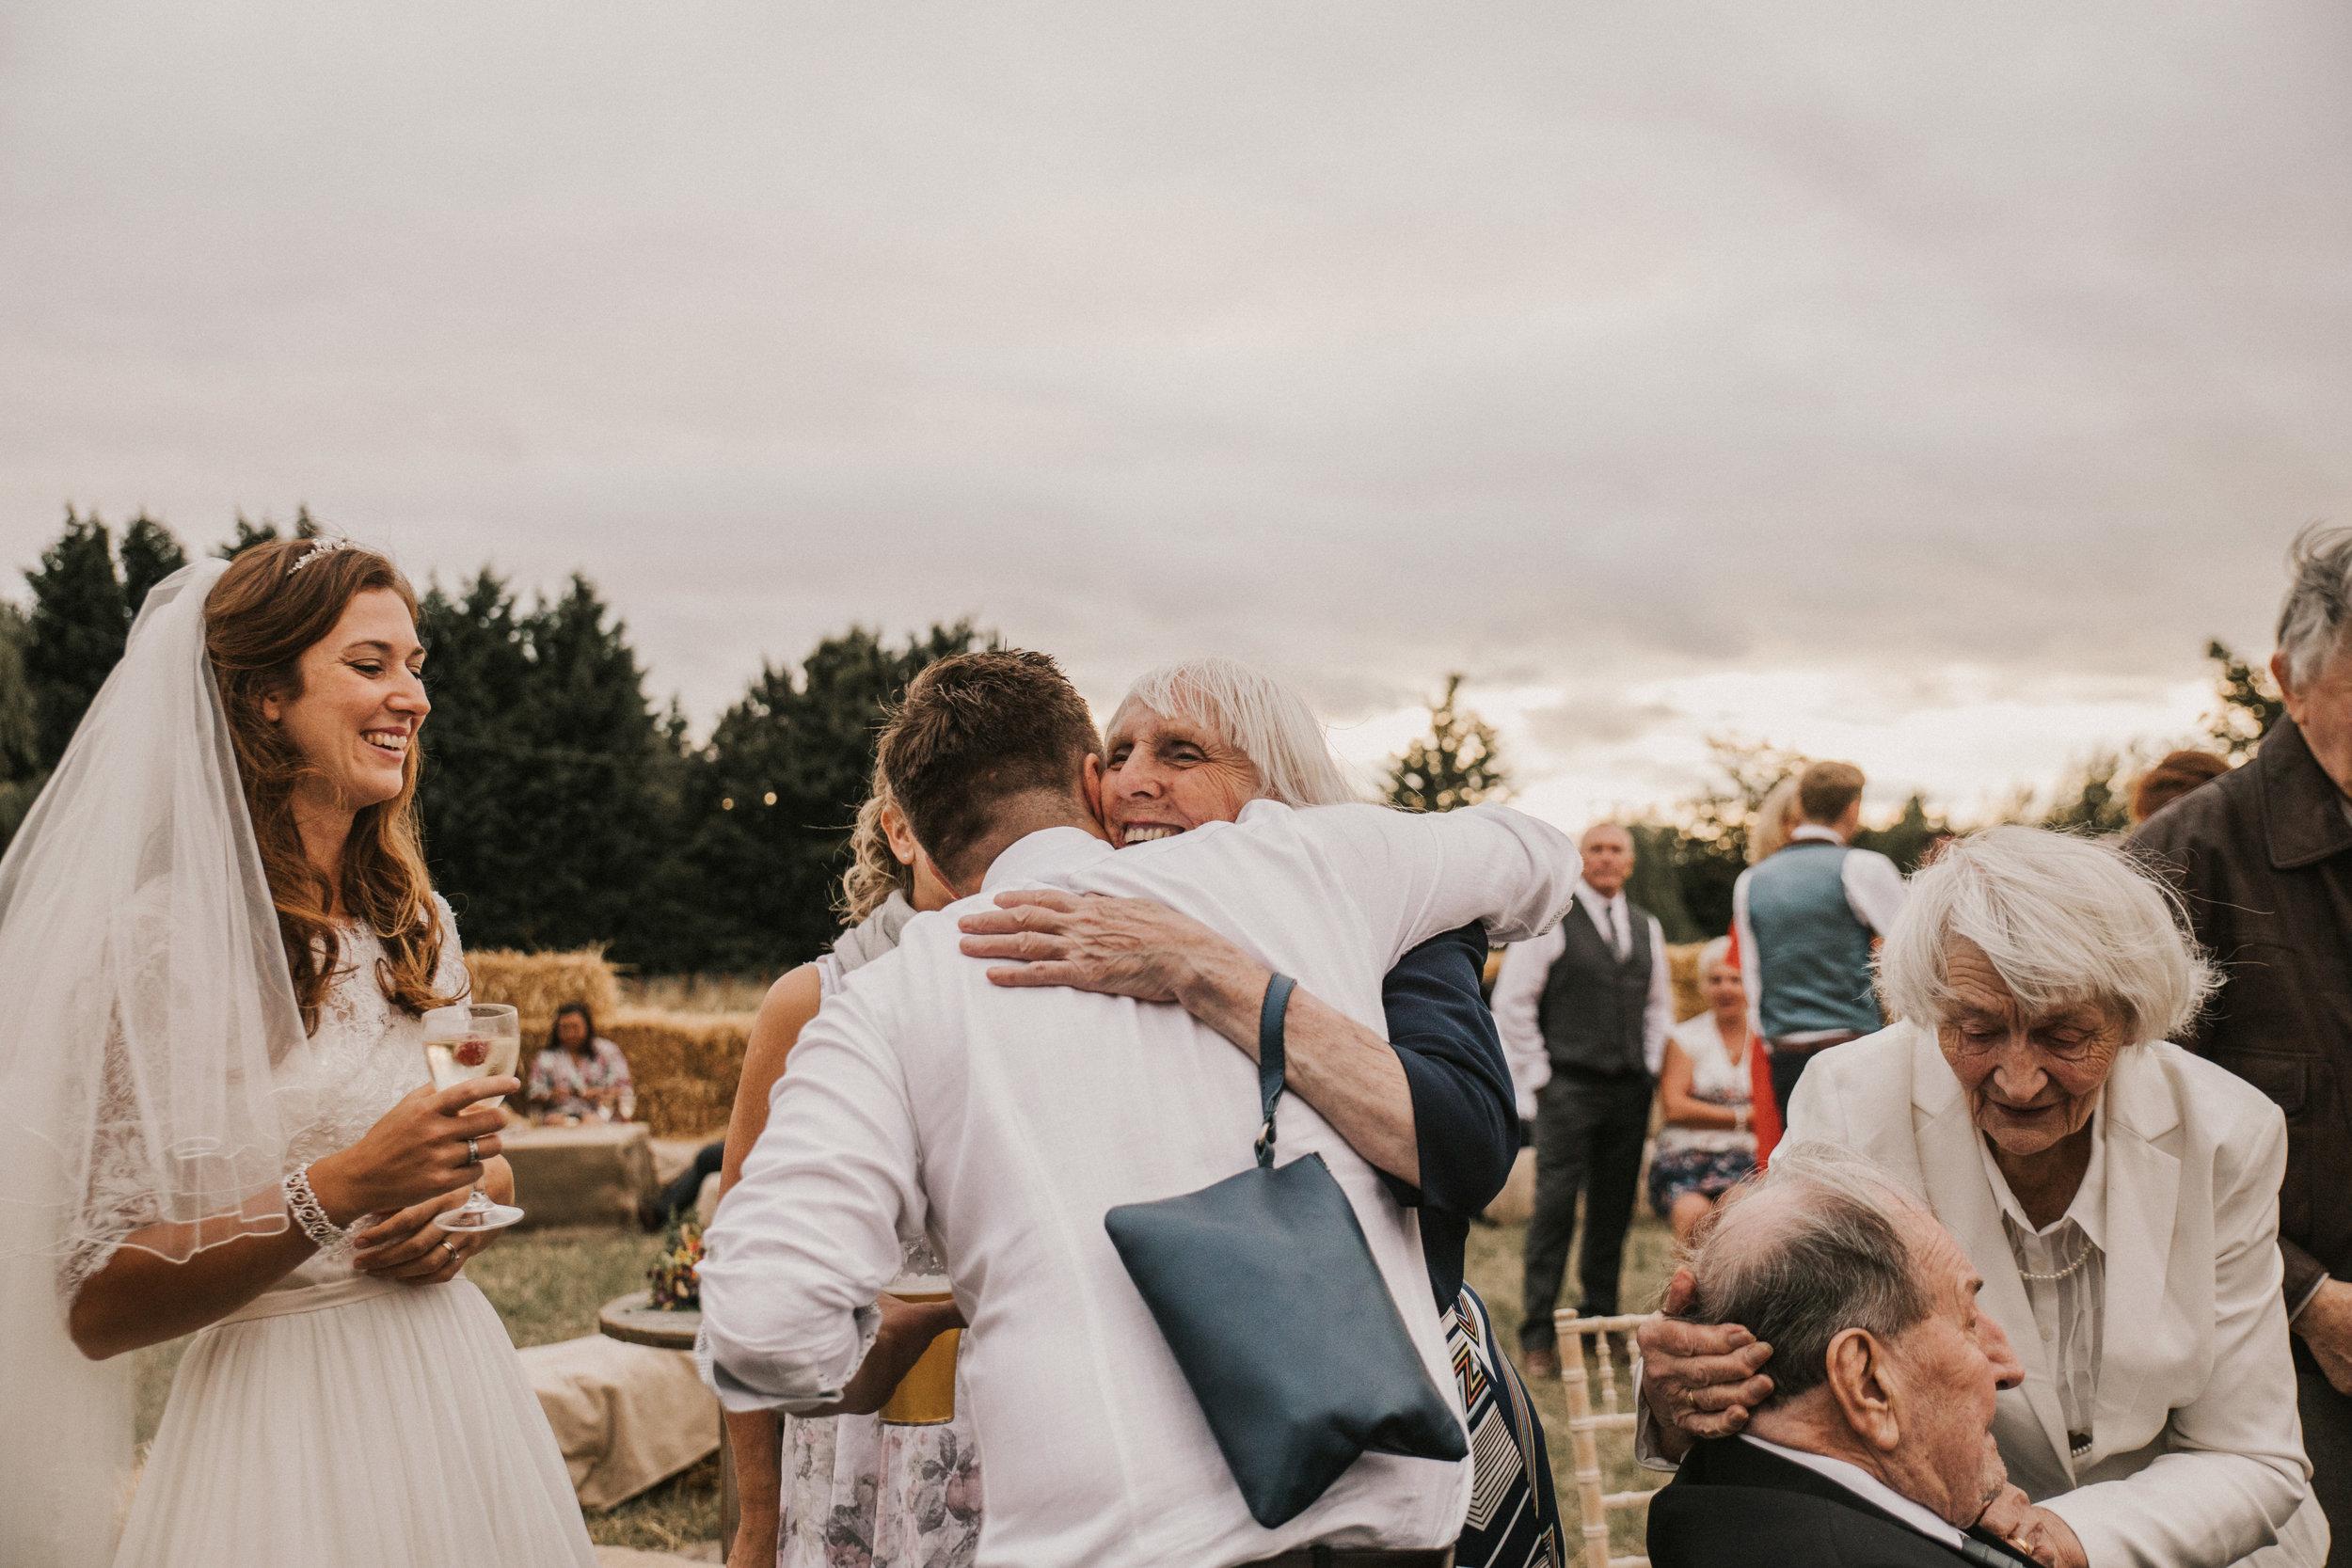 brook rose photography  Farm wedding_105.jpg